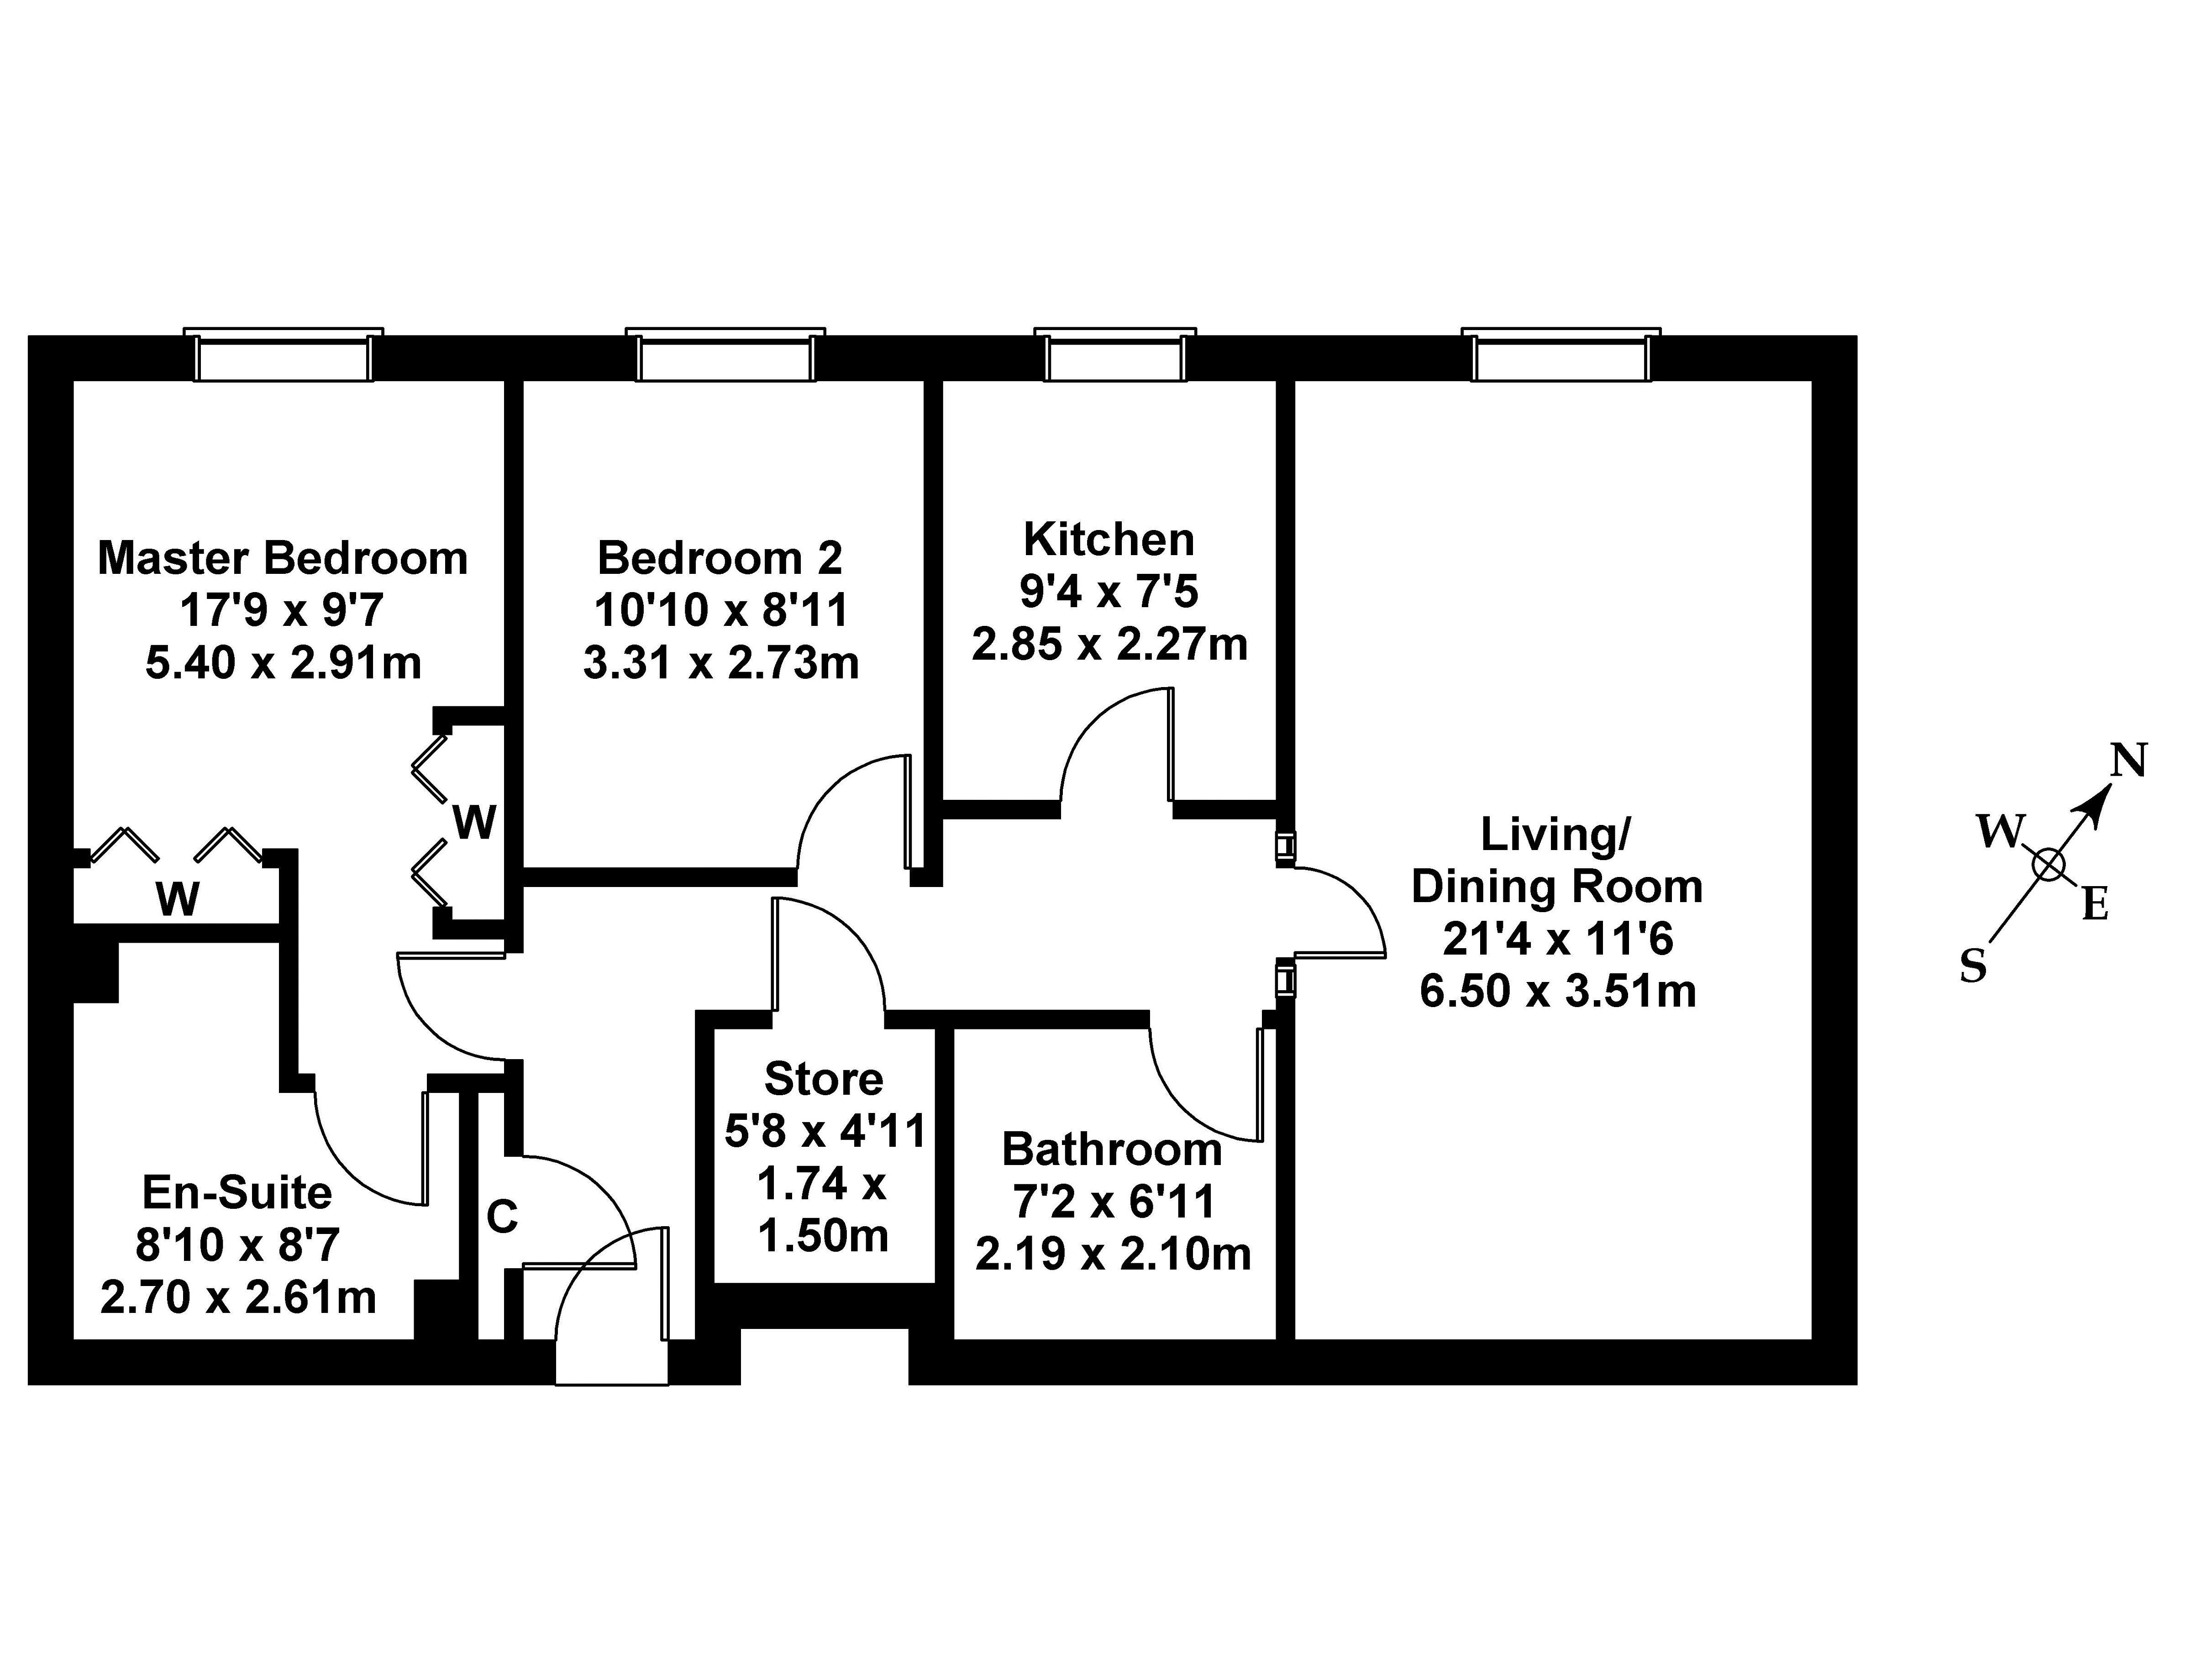 Floorplan 1 of 39/33 Pilrig Heights, Pilrig, Edinburgh, EH6 5FD